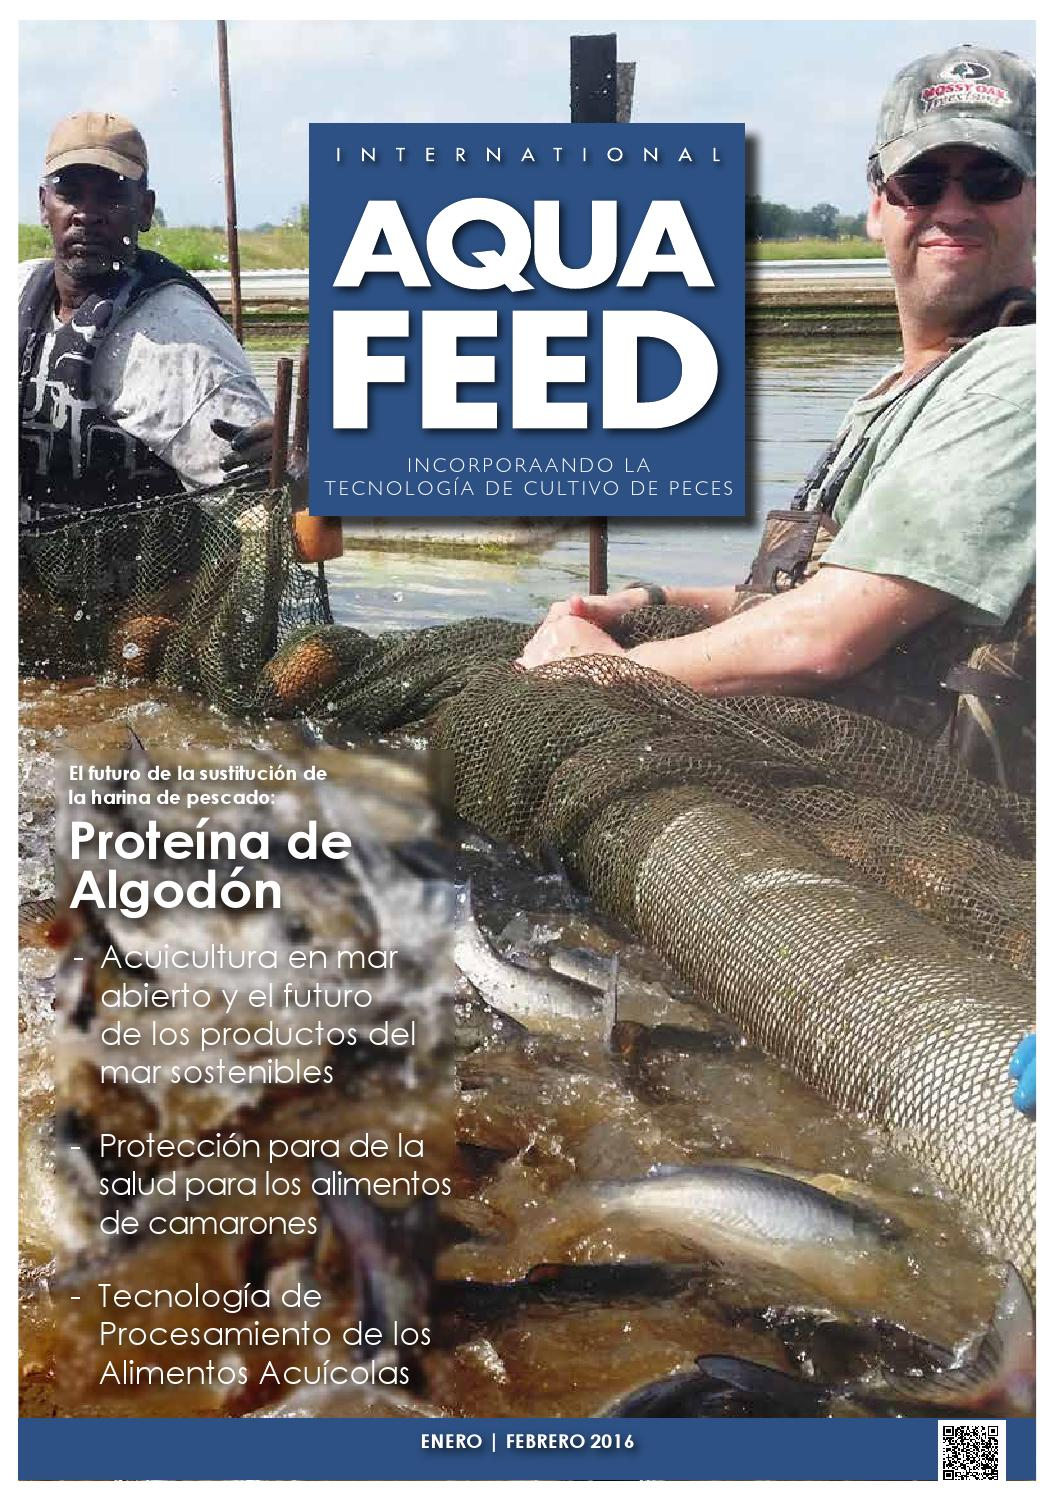 ENERO | FEBRERO 2016 - International Aquafeed - Spanish language ...